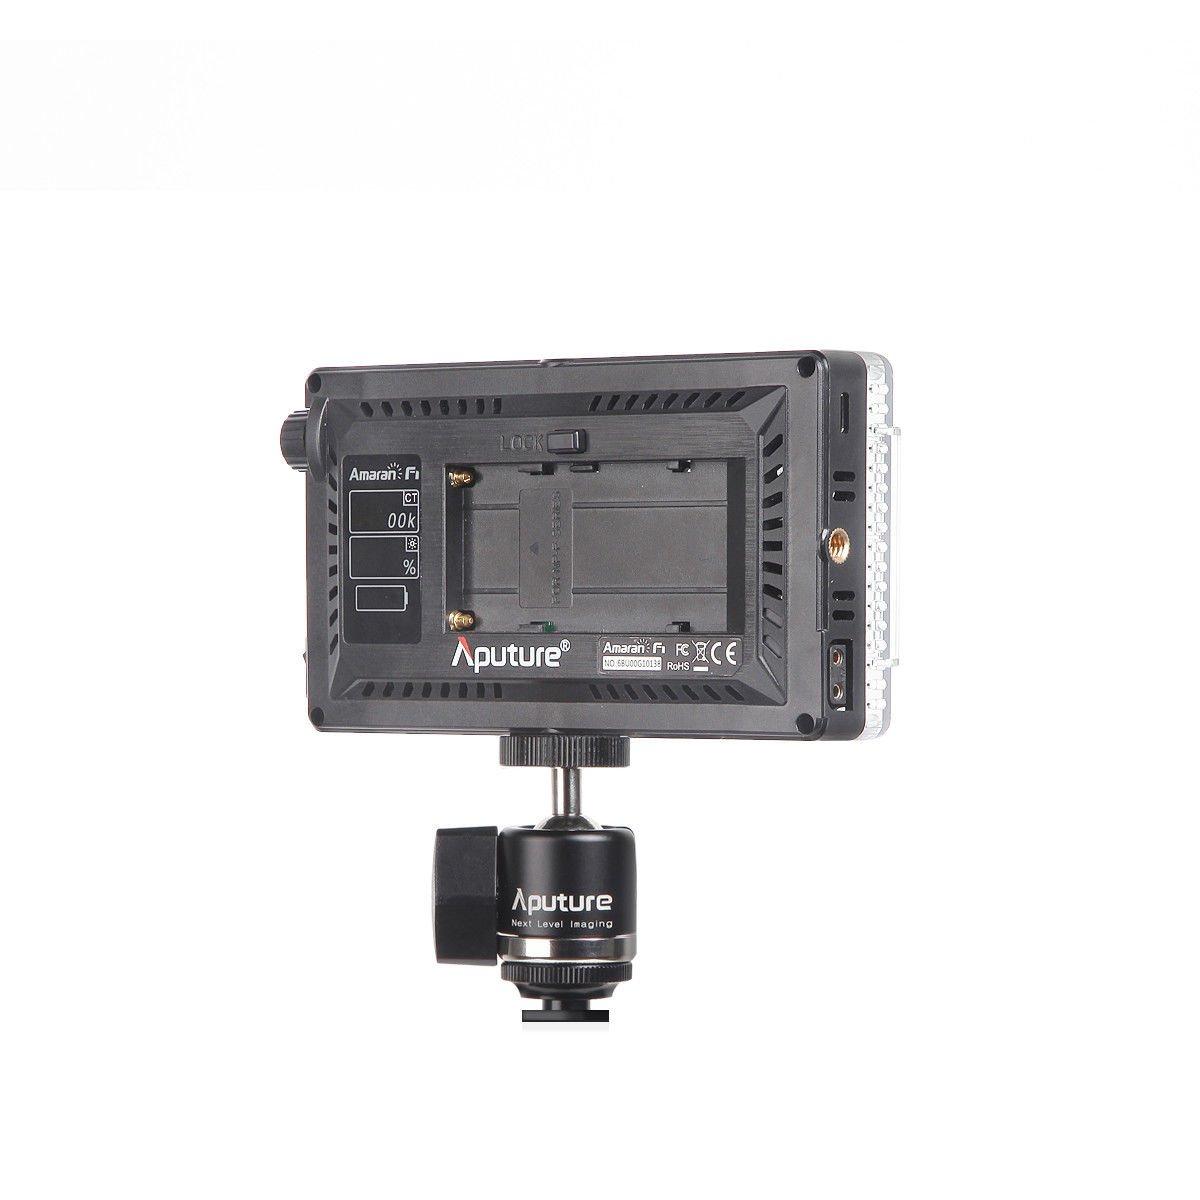 Aputure Amaran AL-F7 3200-9500K CRI/TLCI 95 LED panel LED video camera light (Aputure H198 Upgrade Version) with DigiKit cleaning cloth by Aputure (Image #7)